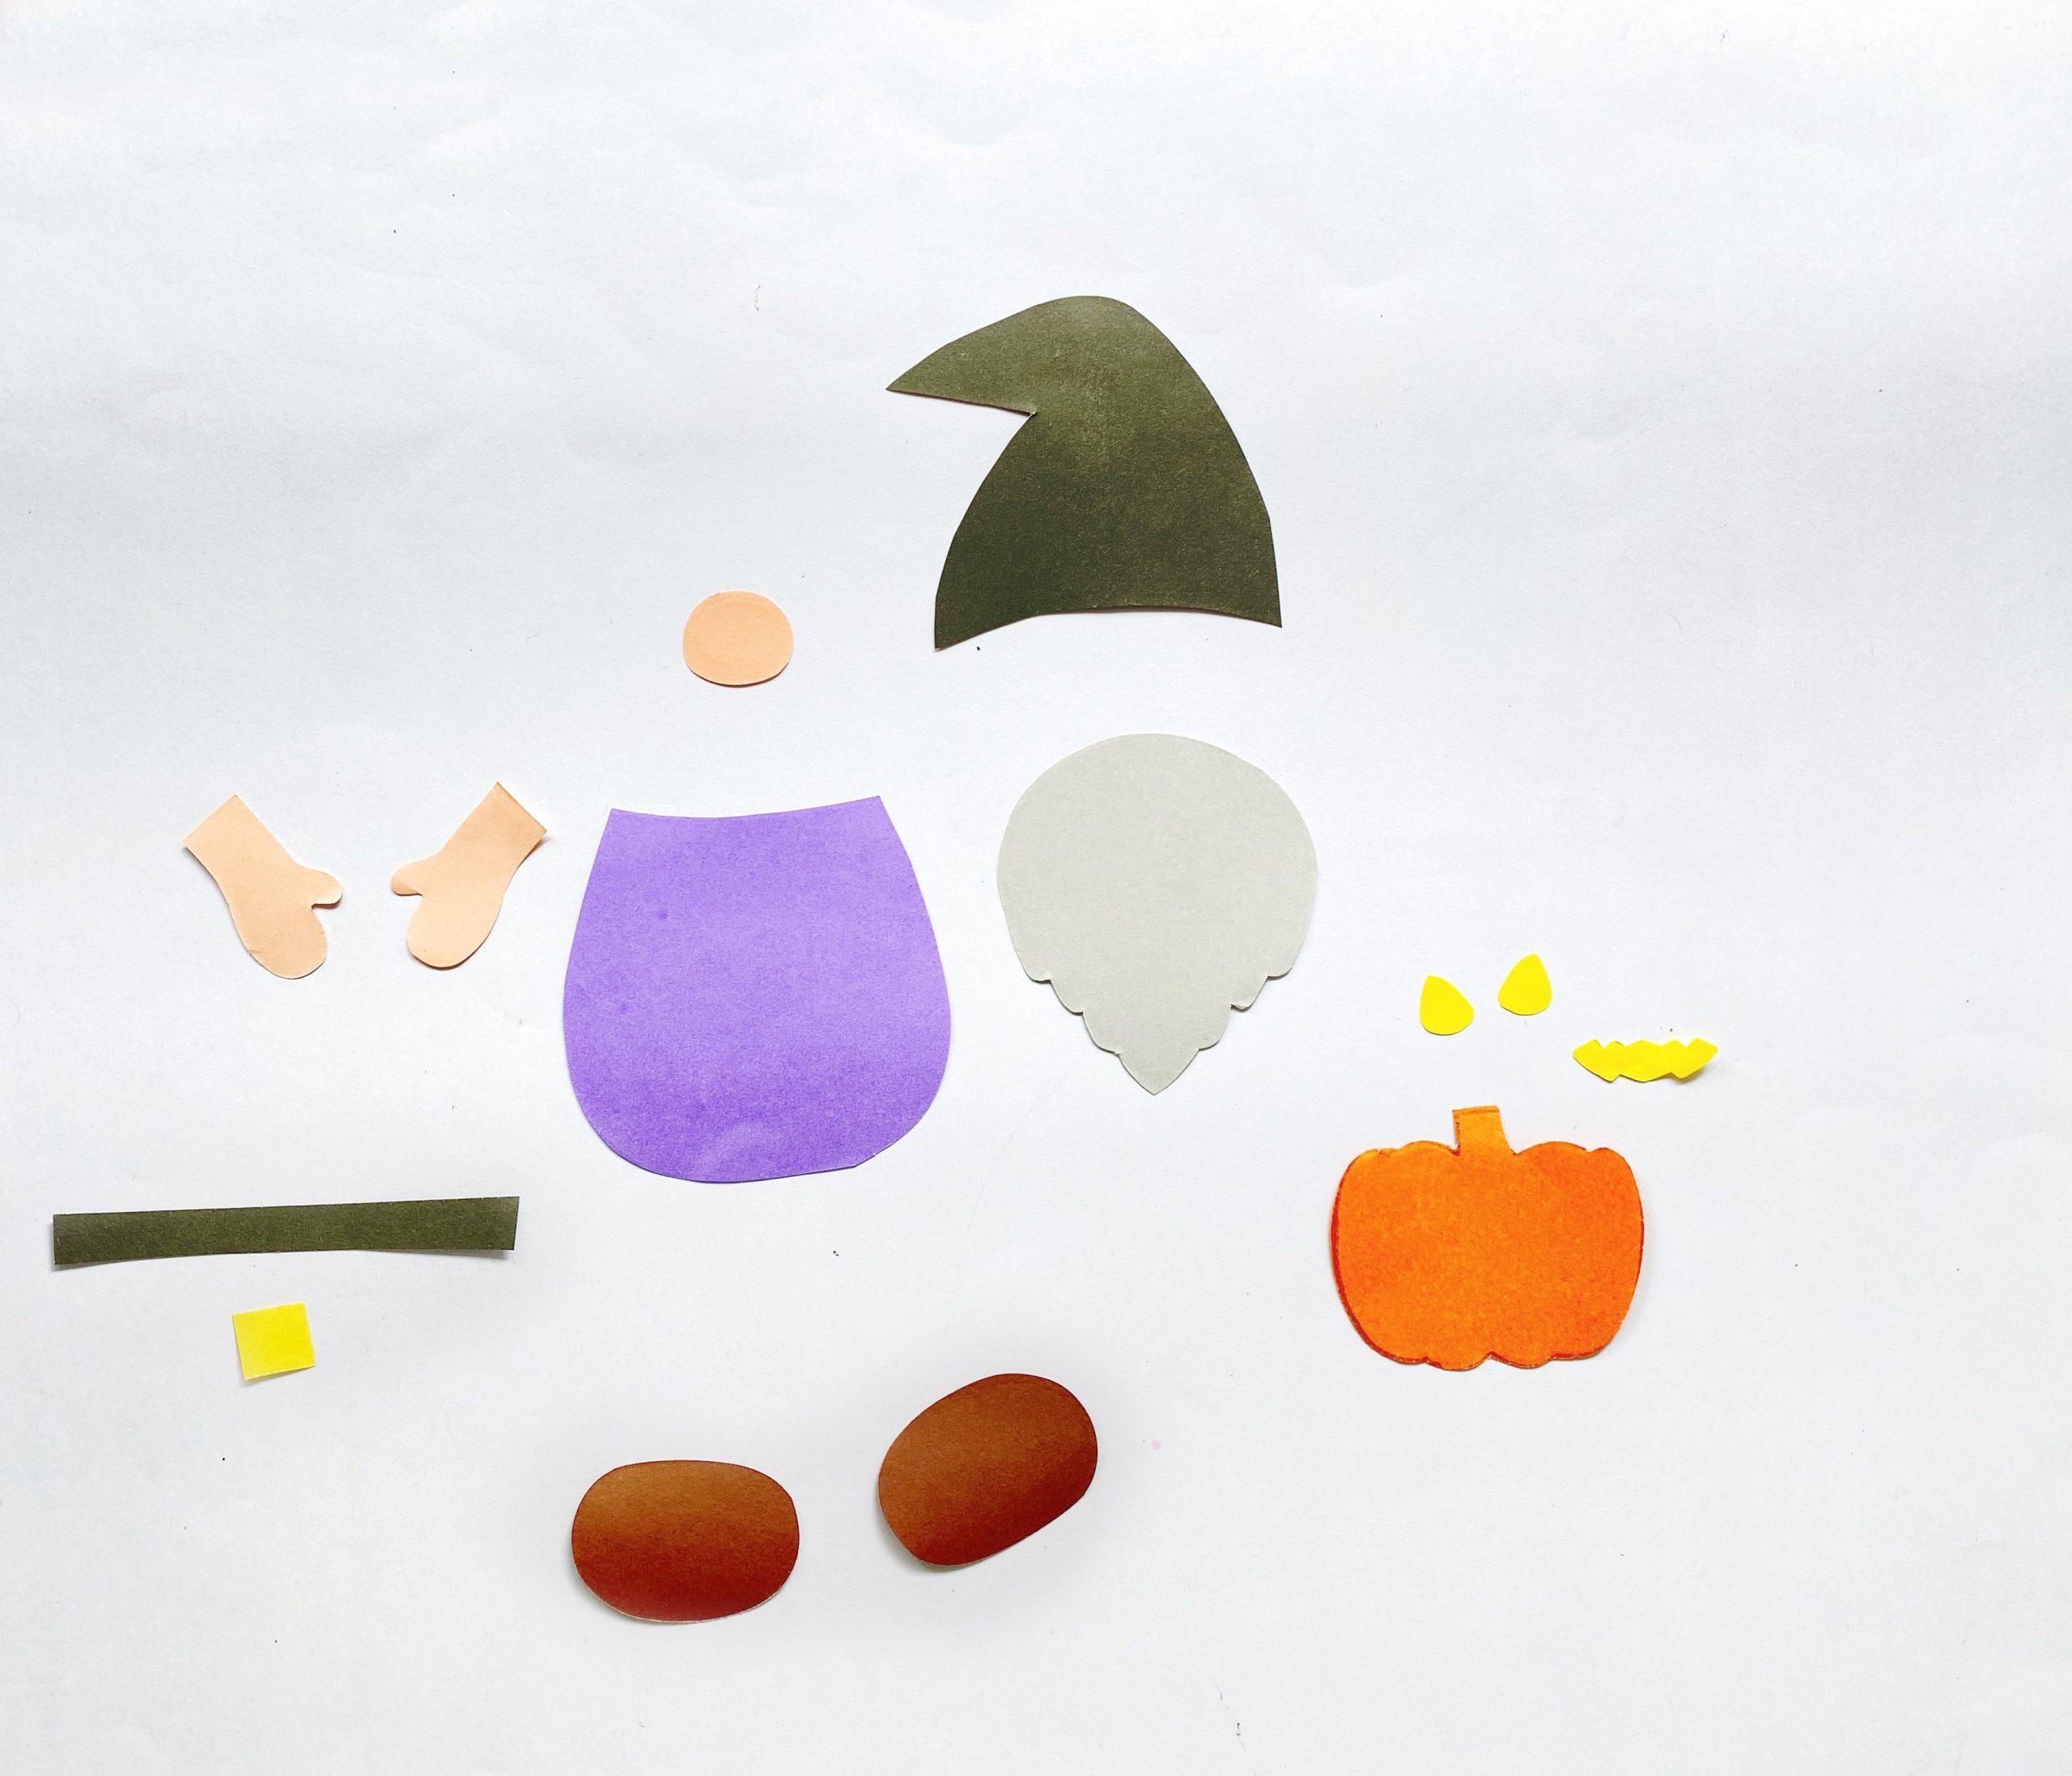 Halloween gnome craft supplies